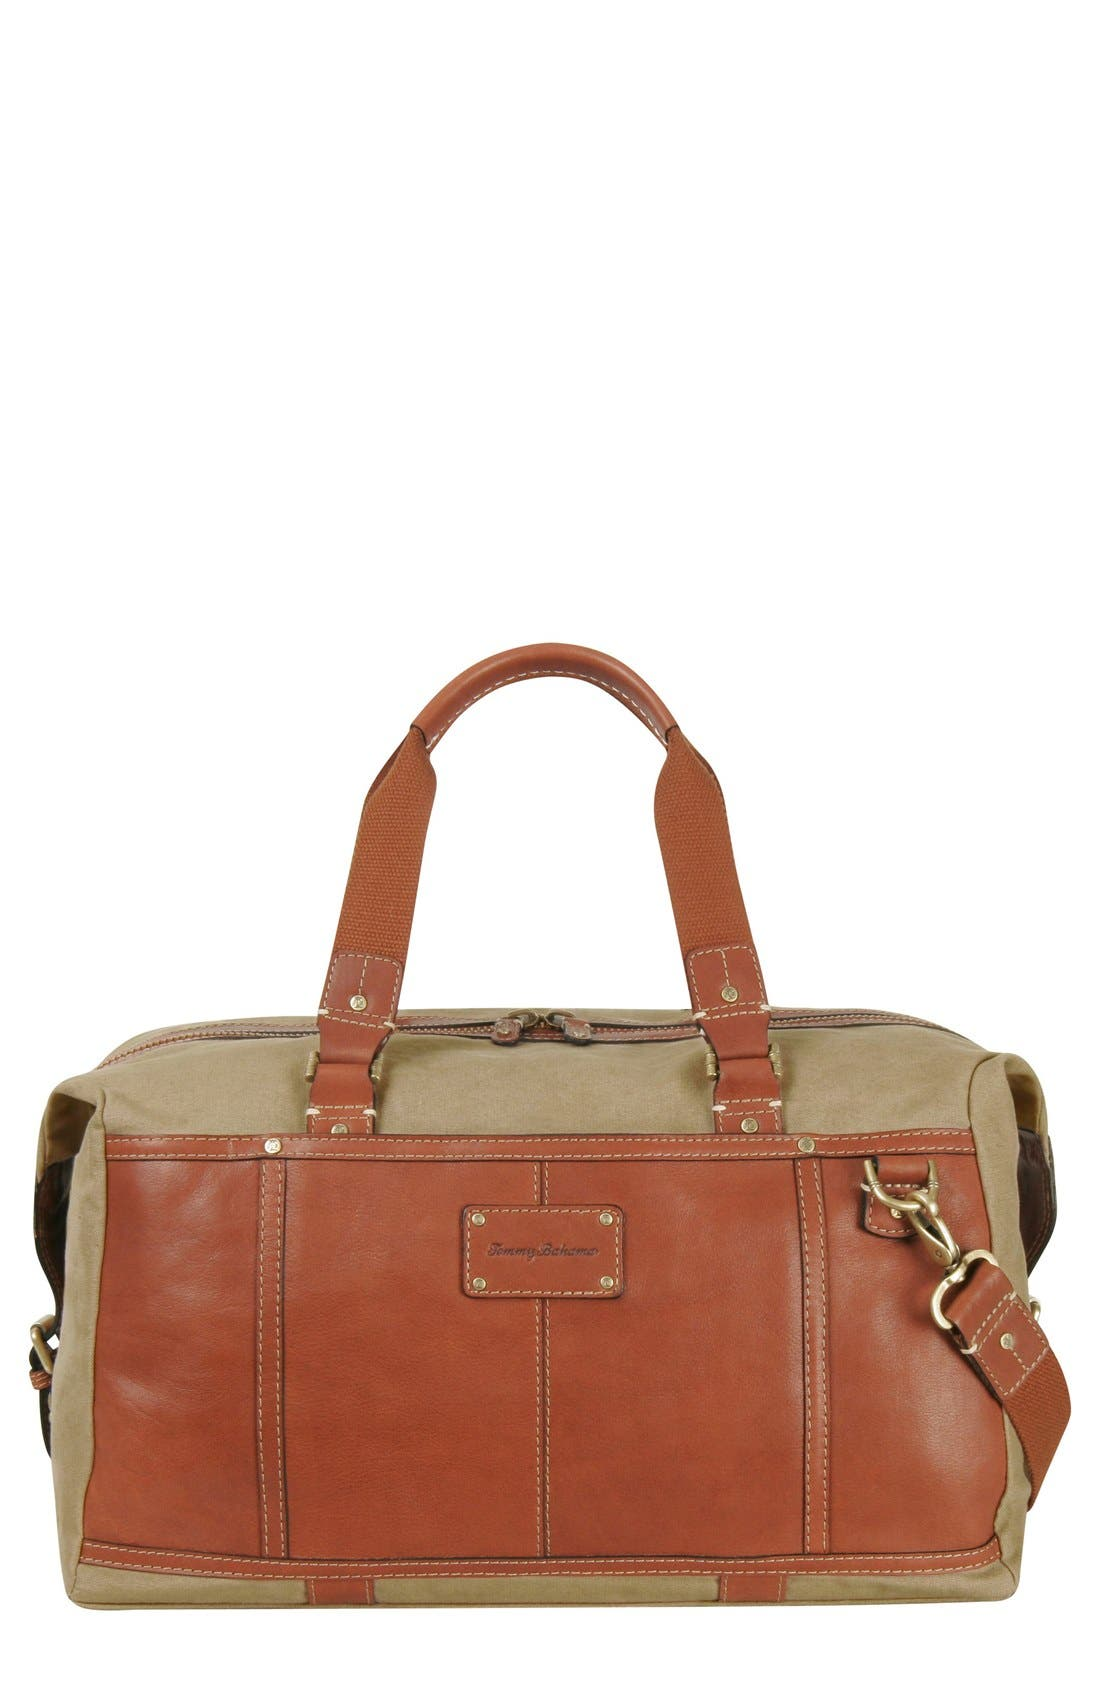 Canvas & Leather Duffel Bag,                             Main thumbnail 1, color,                             210